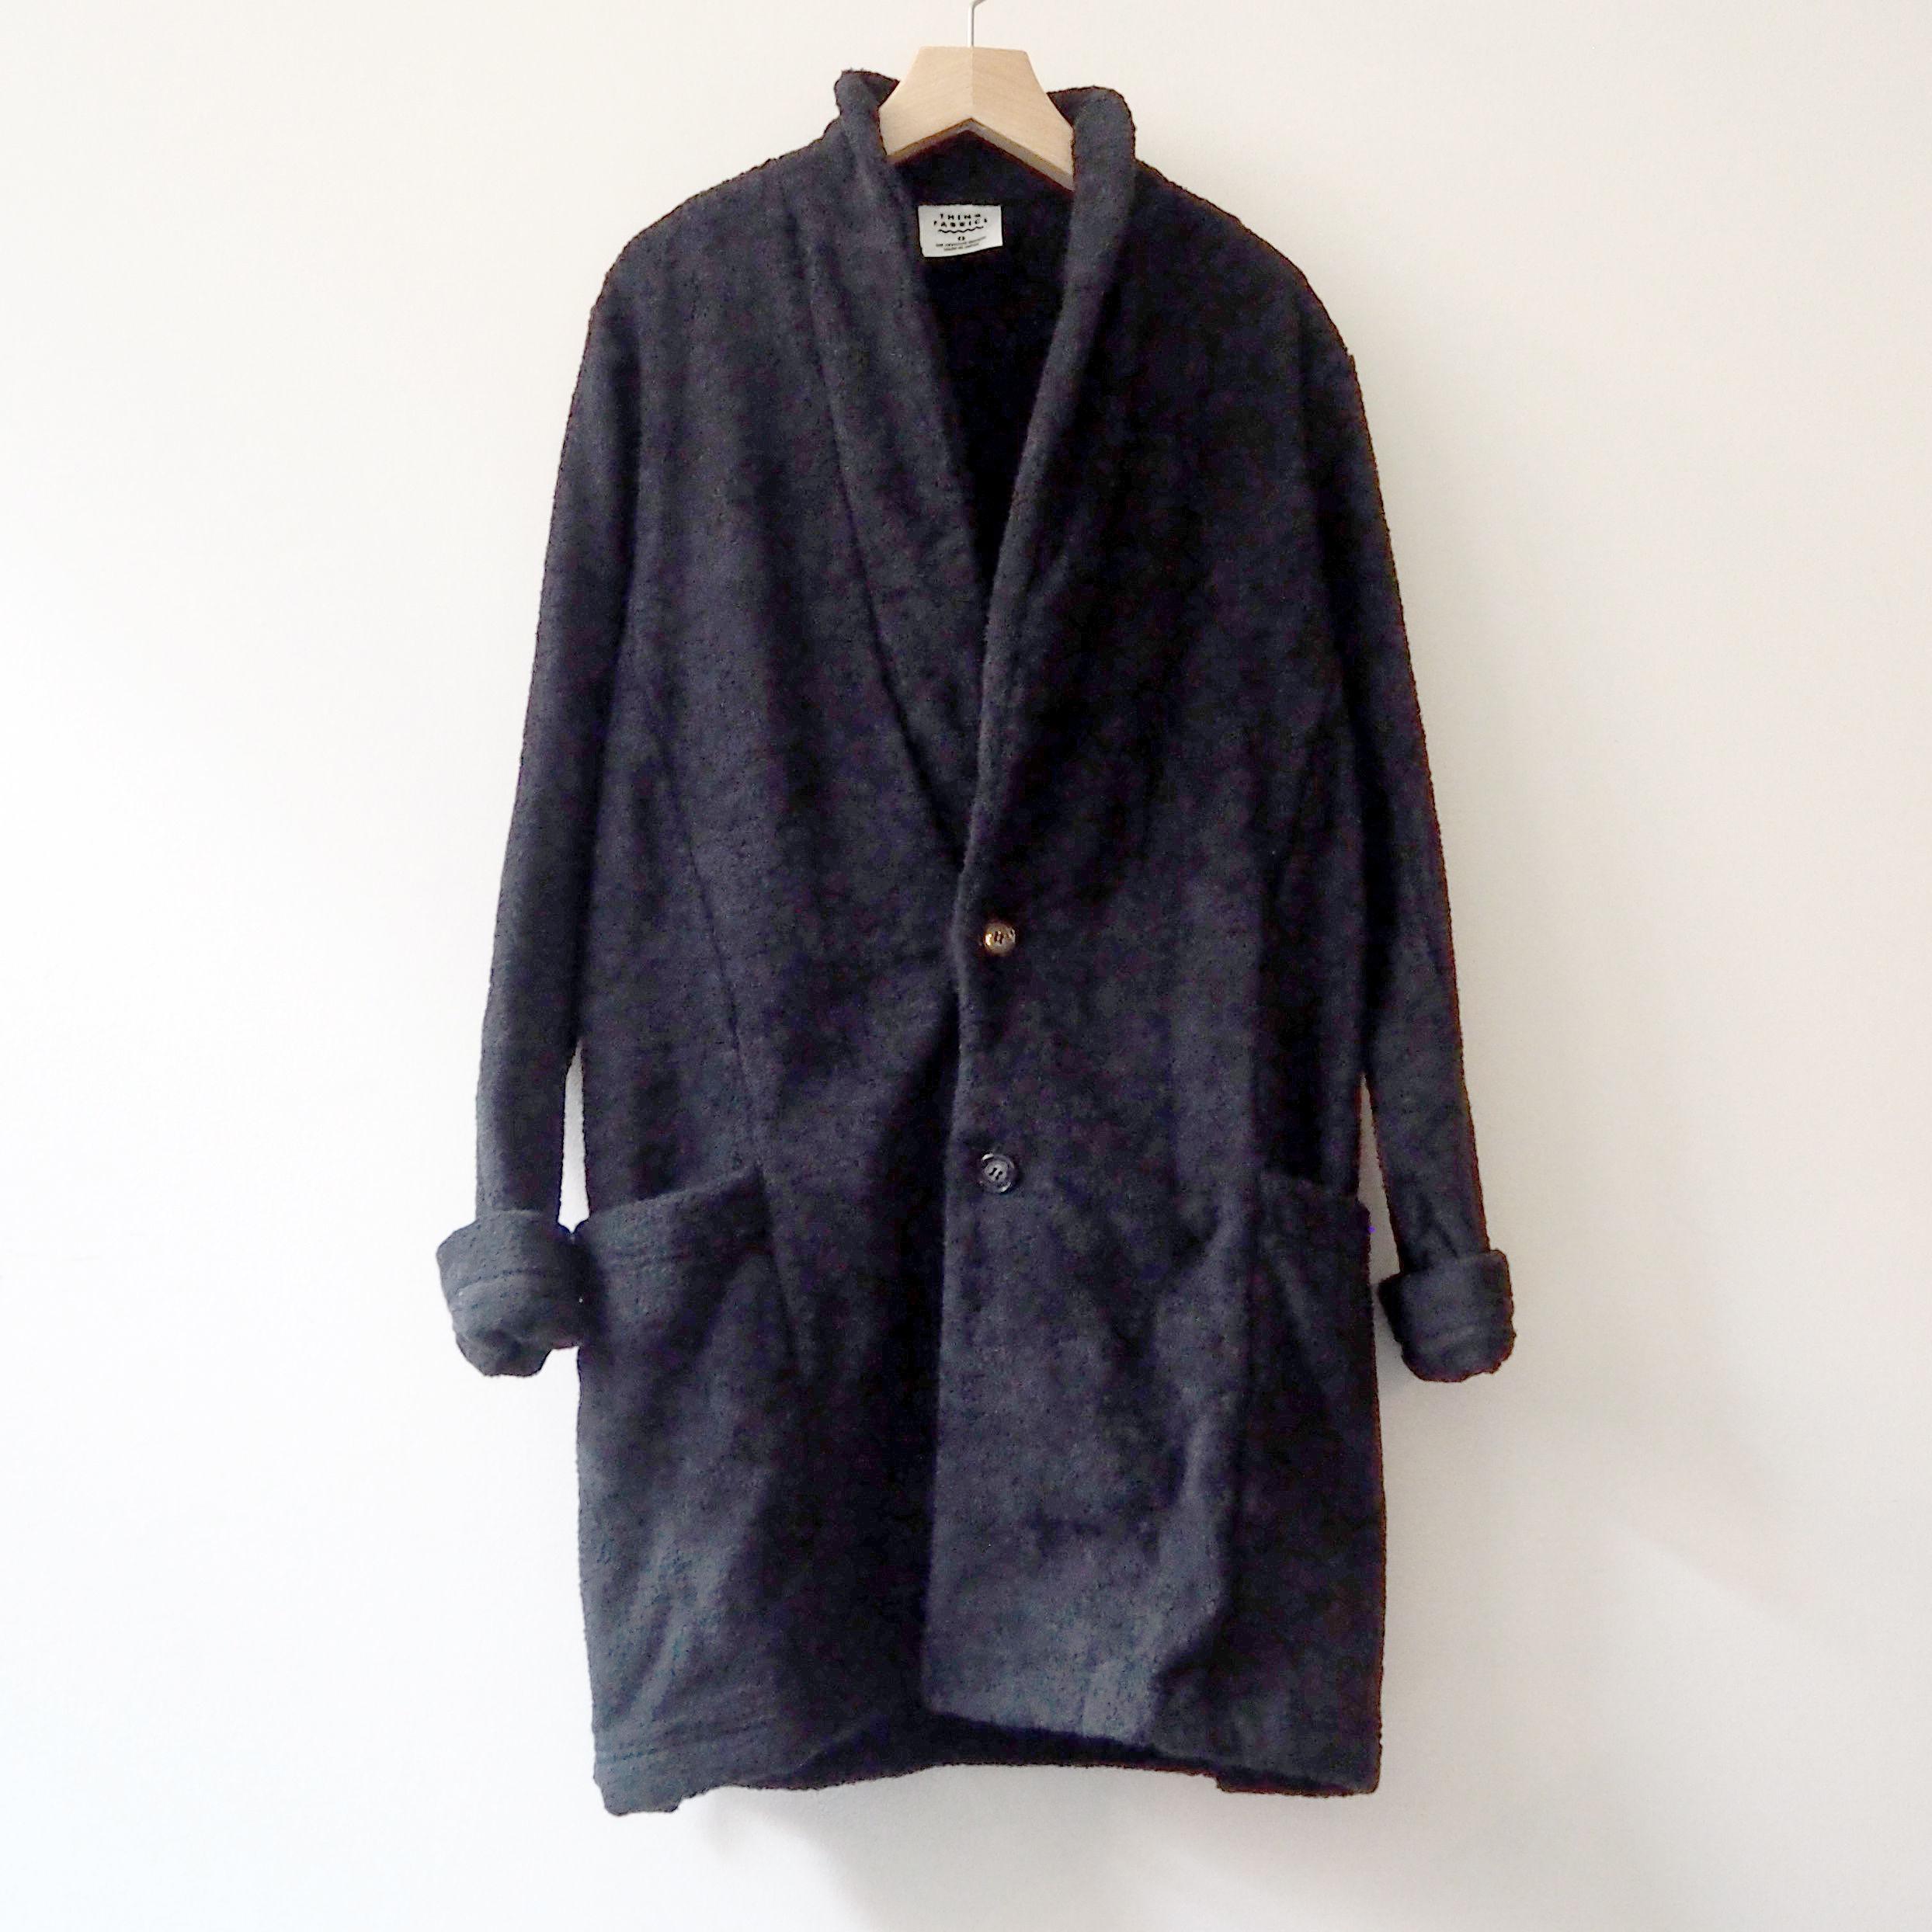 THING FABRICS  Collar Coat(long pile)  Black